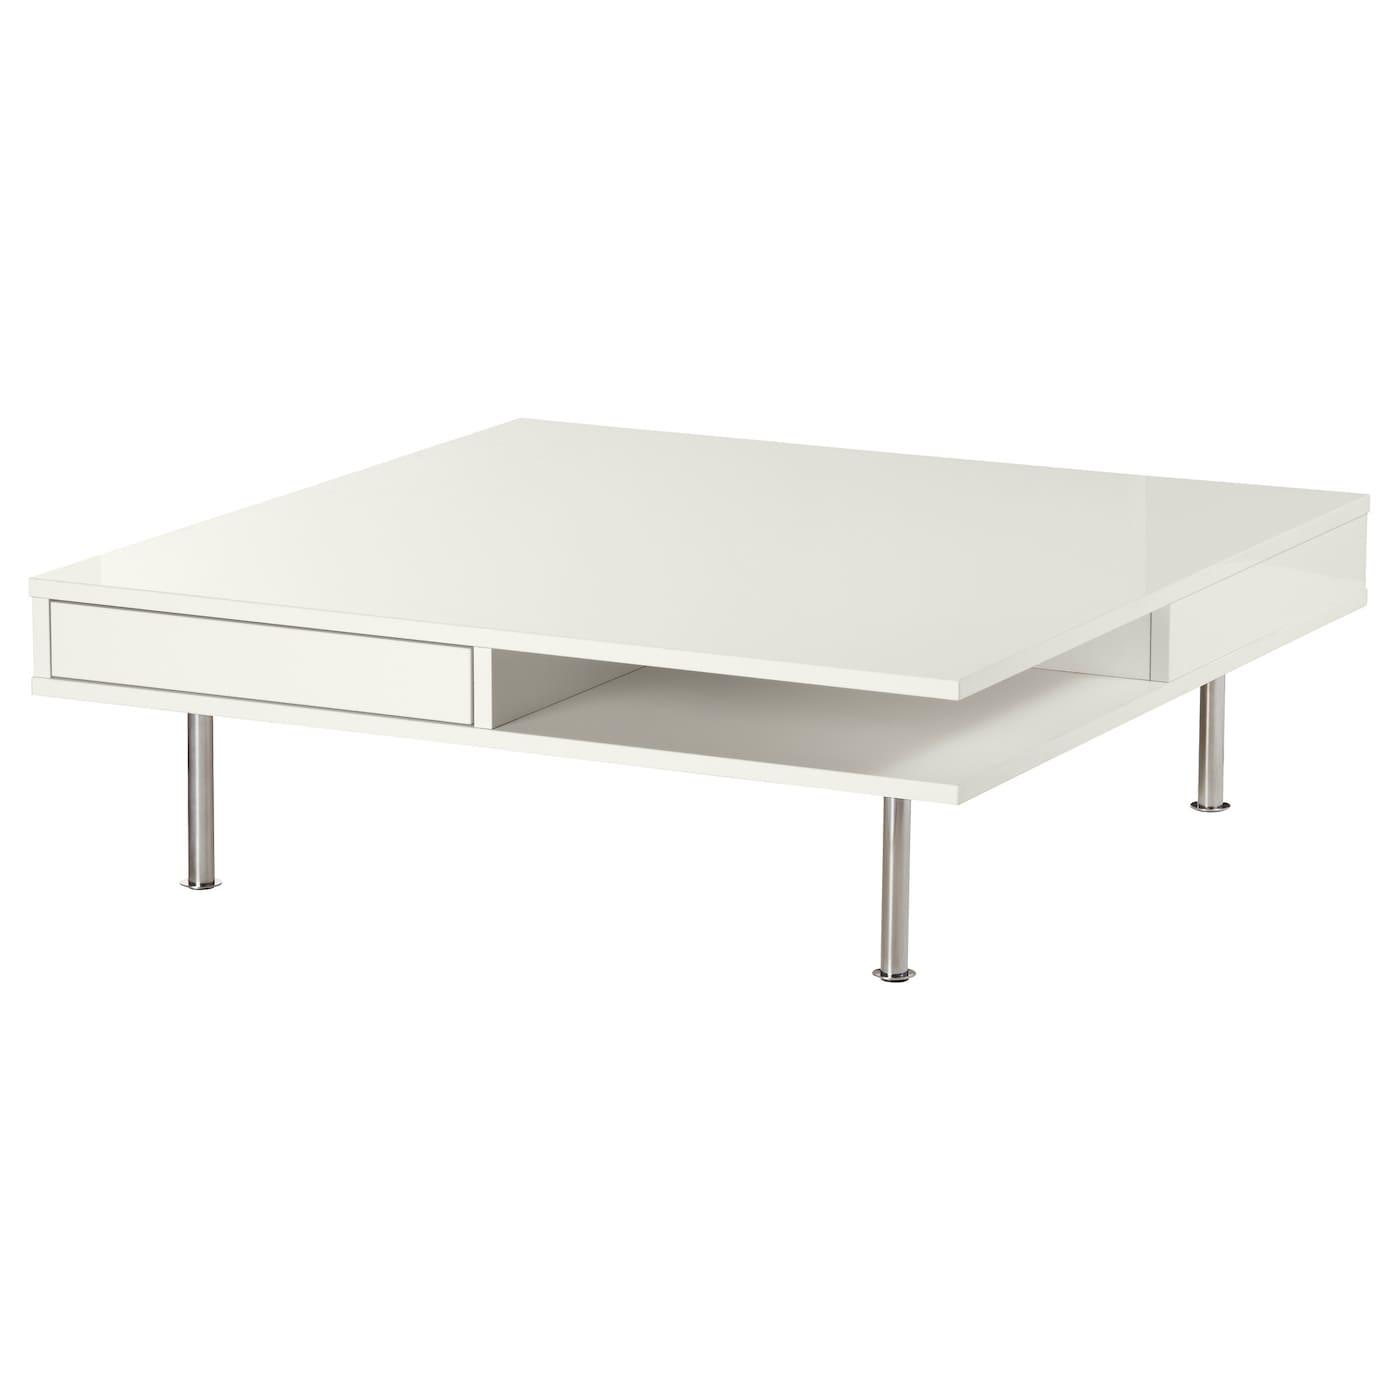 Tofteryd Table Basse Brillant Blanc 95×95 Cm Ikea # Table Basse Pour Salon Ikea